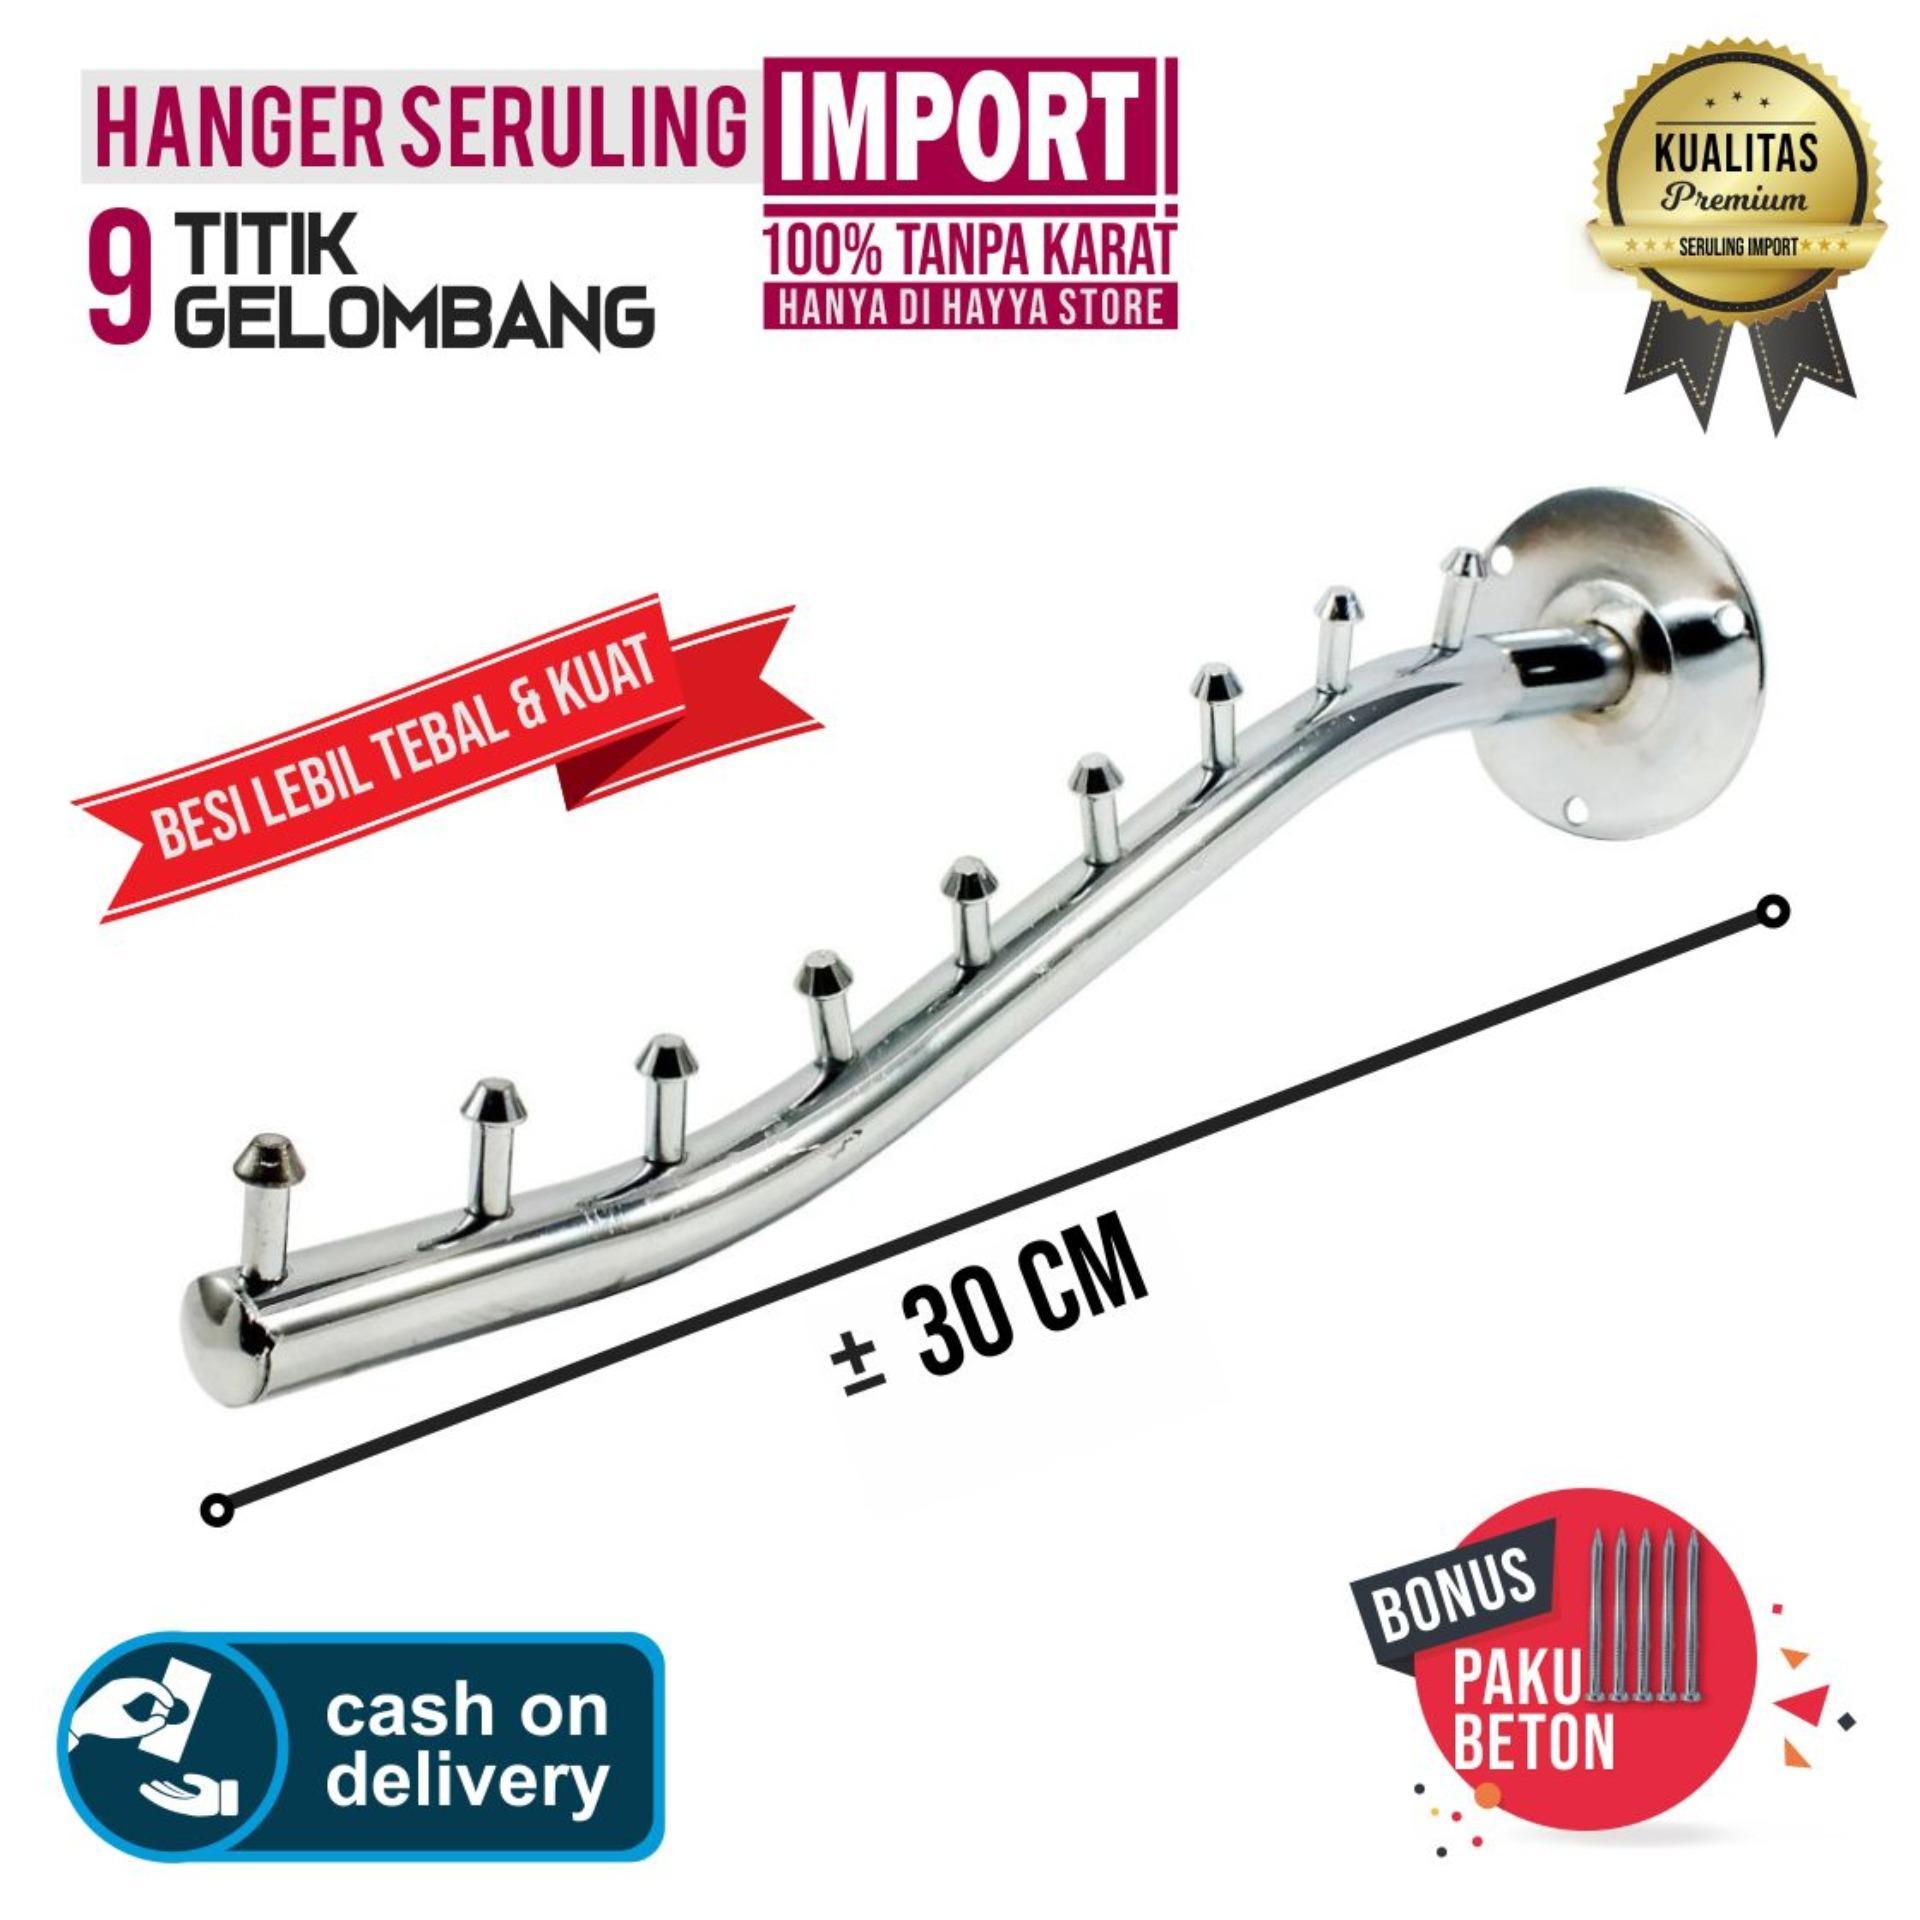 Hanger Gantungan Baju Model Seruling Tembok 9 Titik - Import